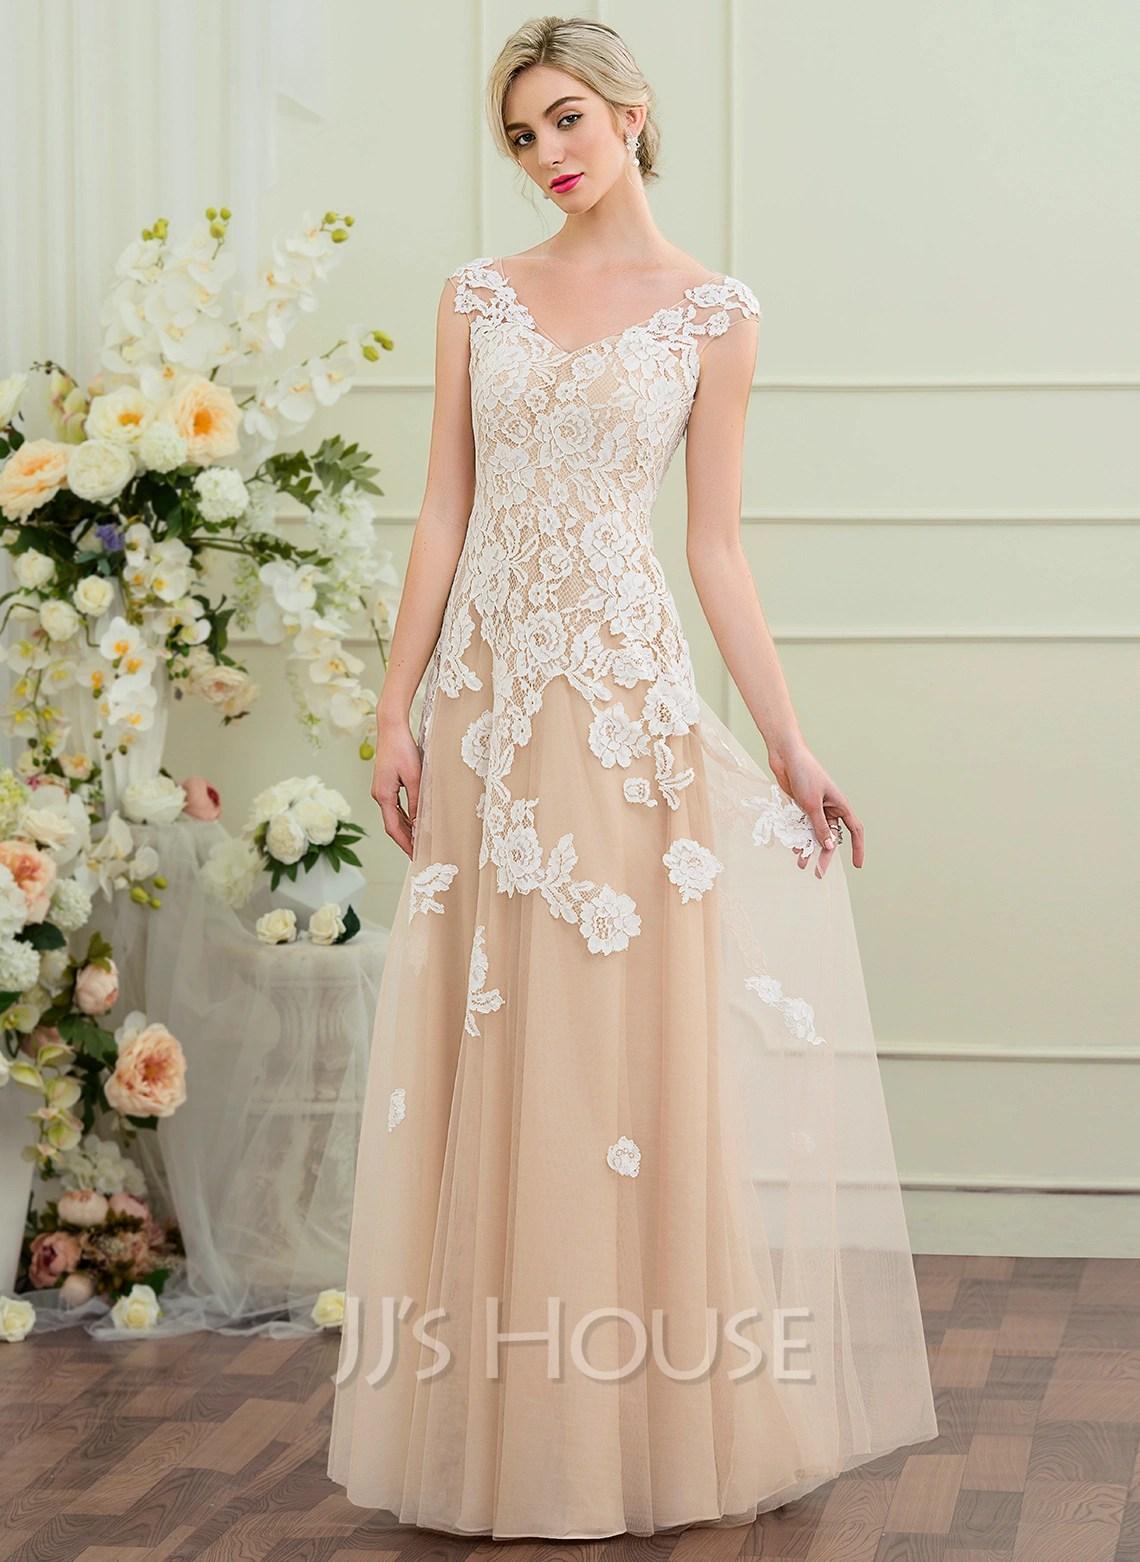 Cheap Wedding Dresses c2 discounted wedding dresses A Line Princess V neck Floor Length Tulle Wedding Dress